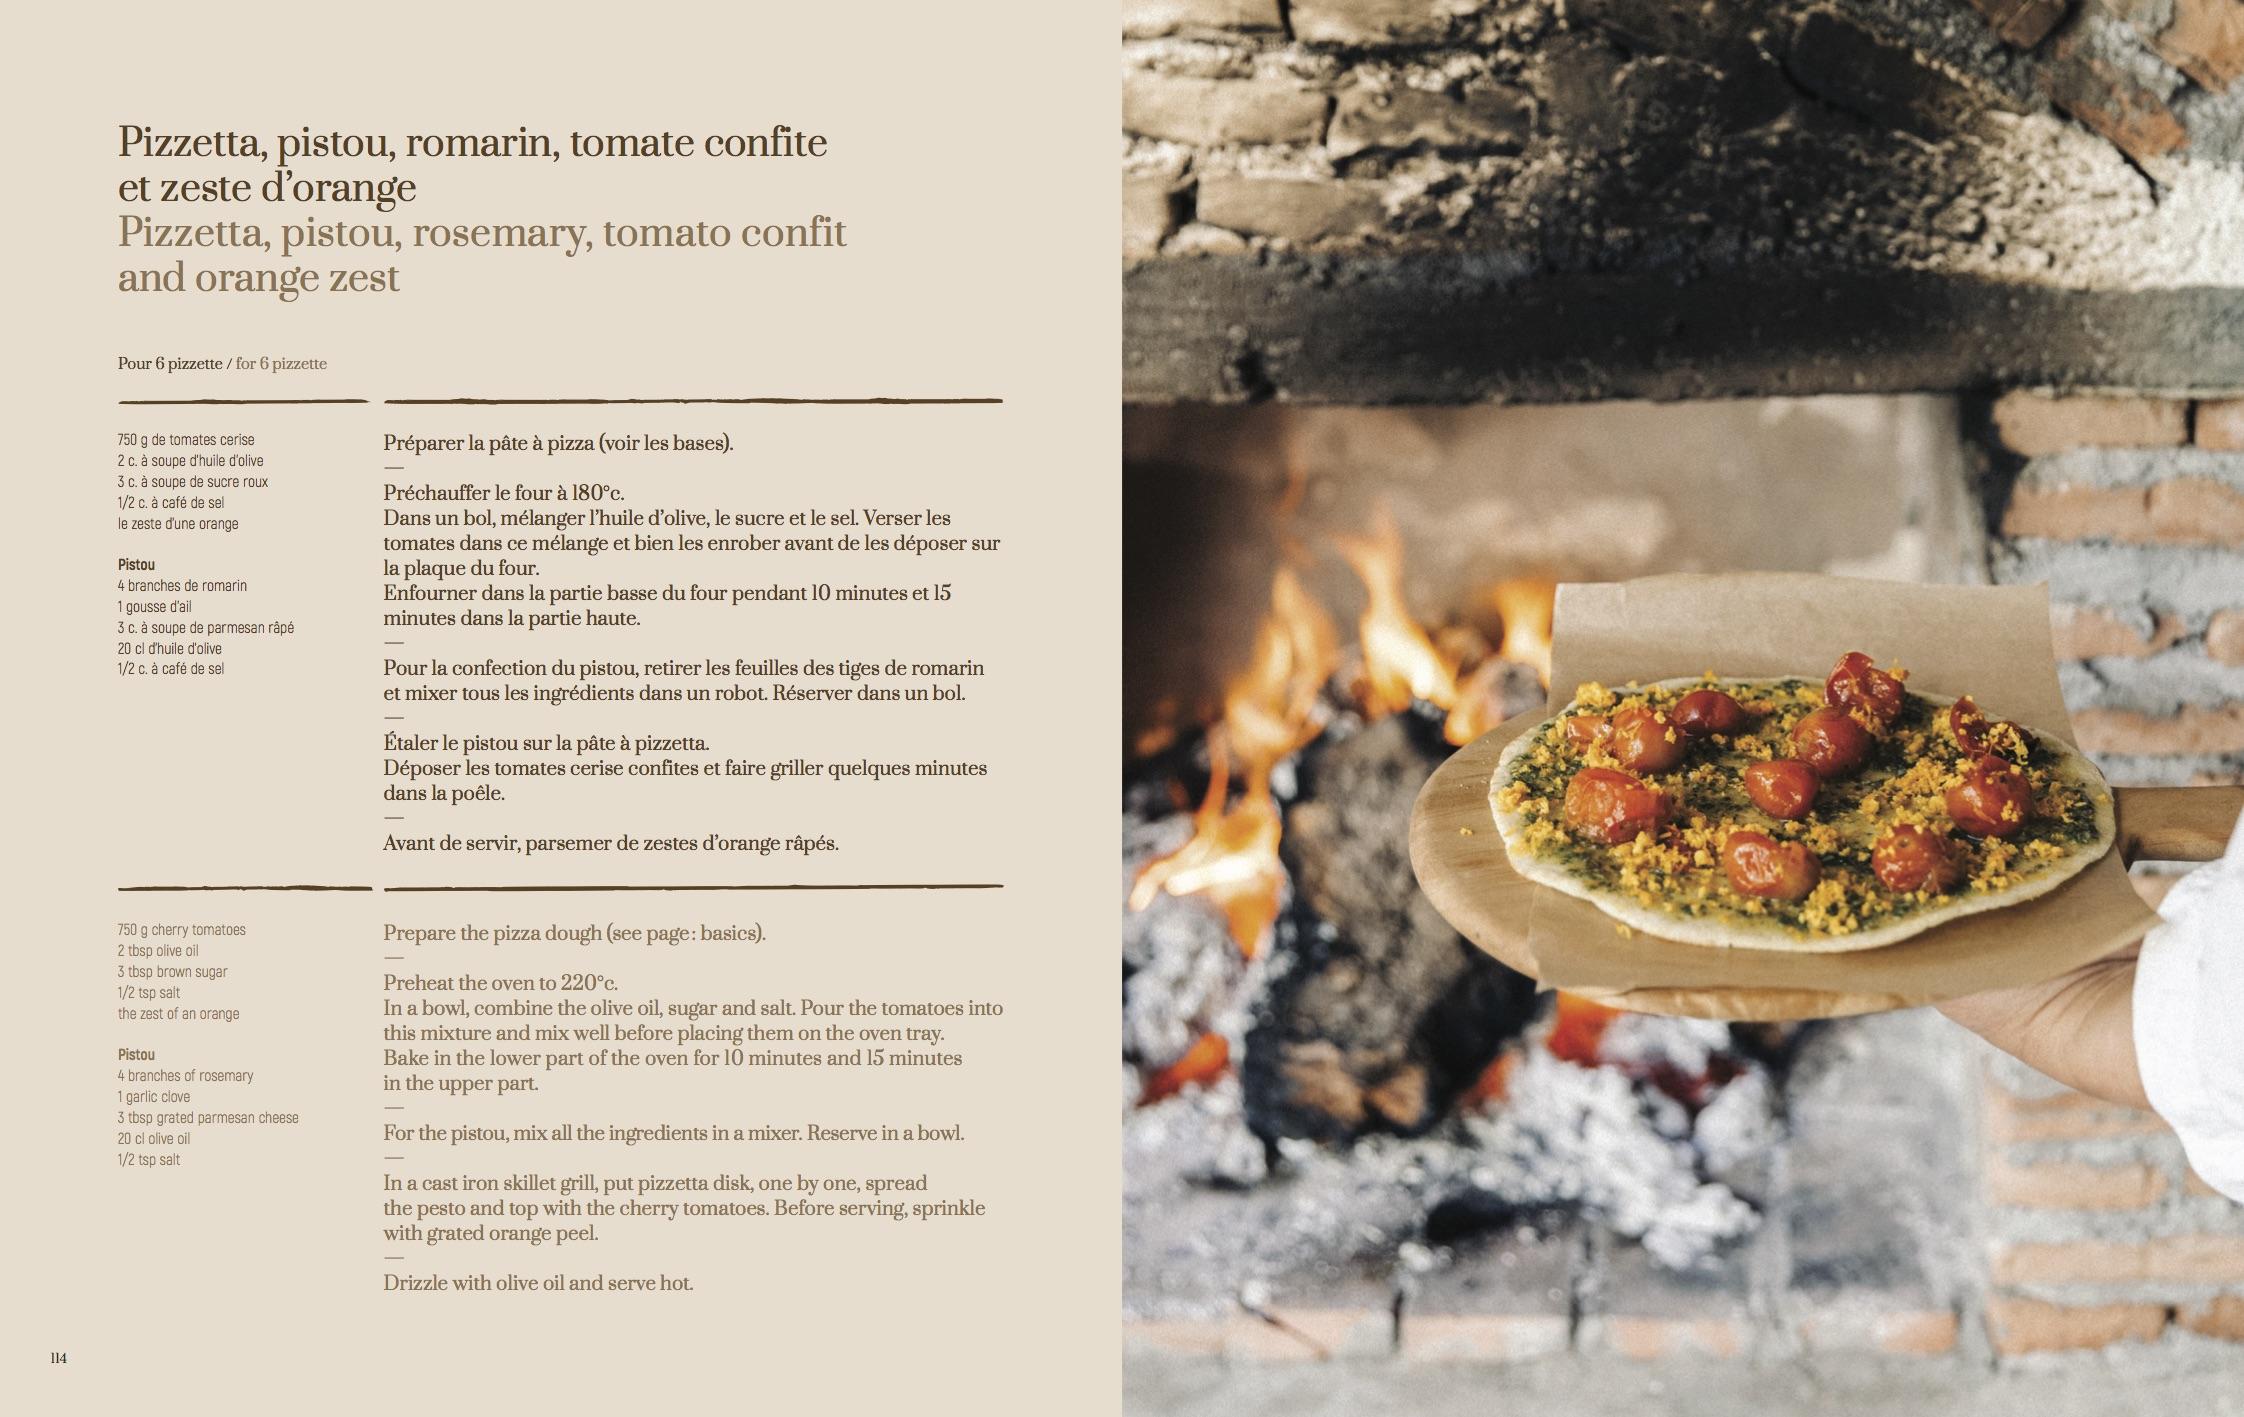 COOKBOOK_LAFAMILLE pizzetta.jpg